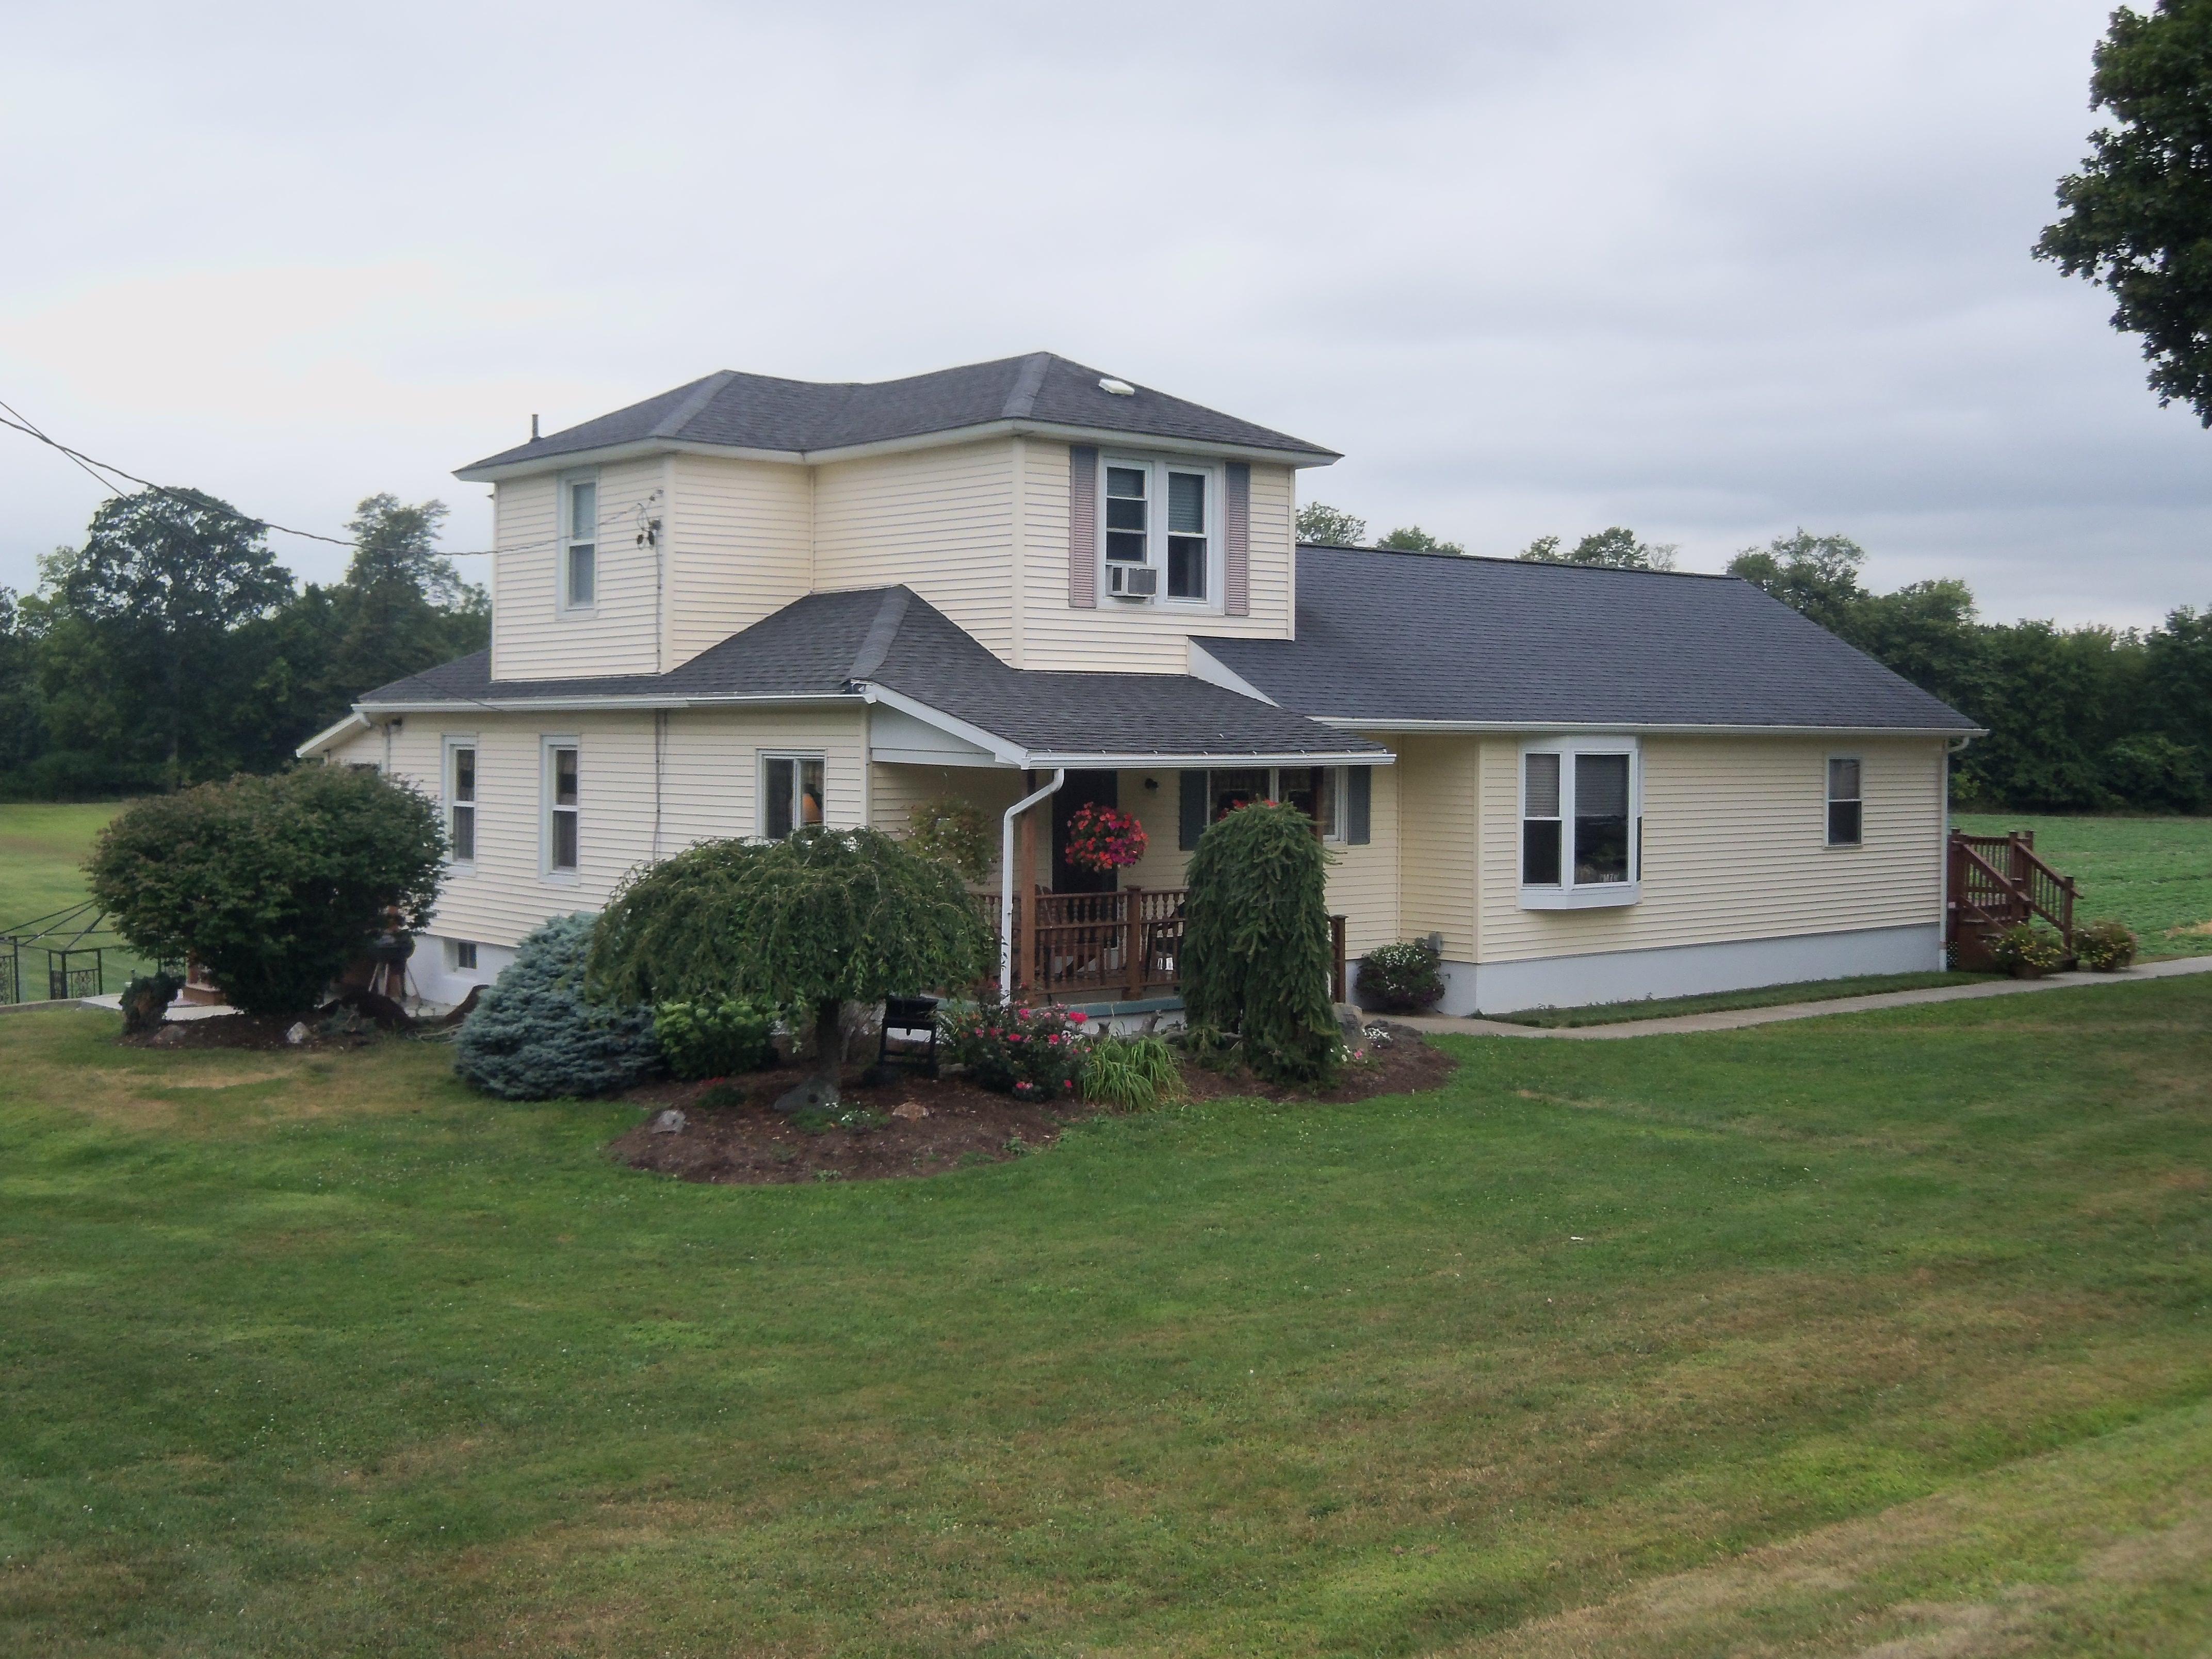 635 Riverside Drive, Athens, Pennsylvania 18810